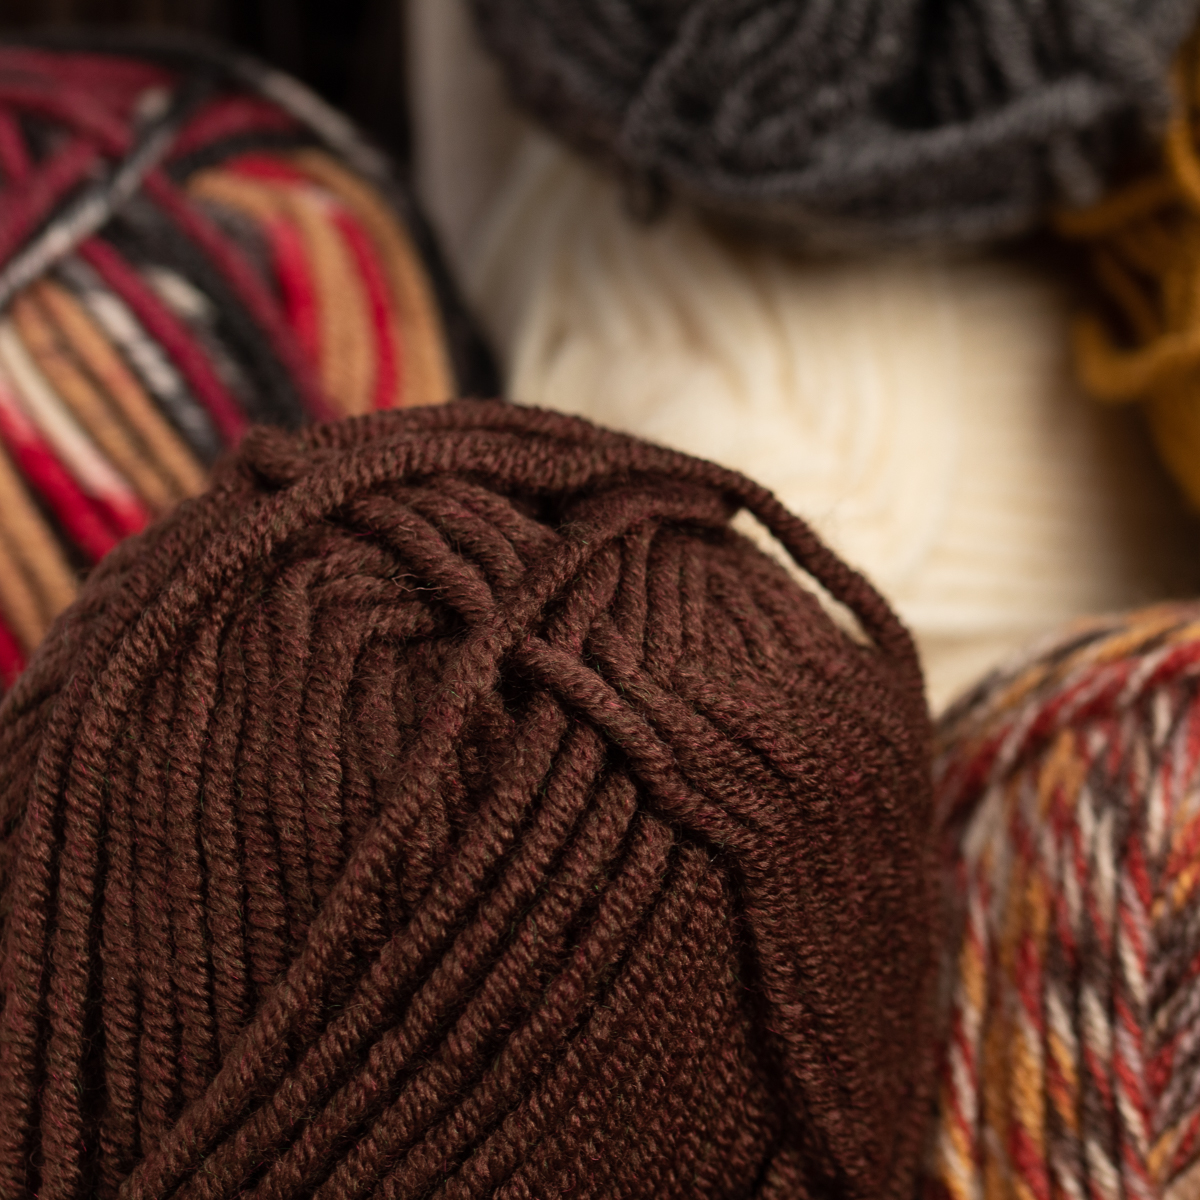 3pk-Lion-Brand-Woolspun-Acrylic-amp-Wool-Yarn-Bulky-5-Knit-Crocheting-Skeins-Soft thumbnail 26